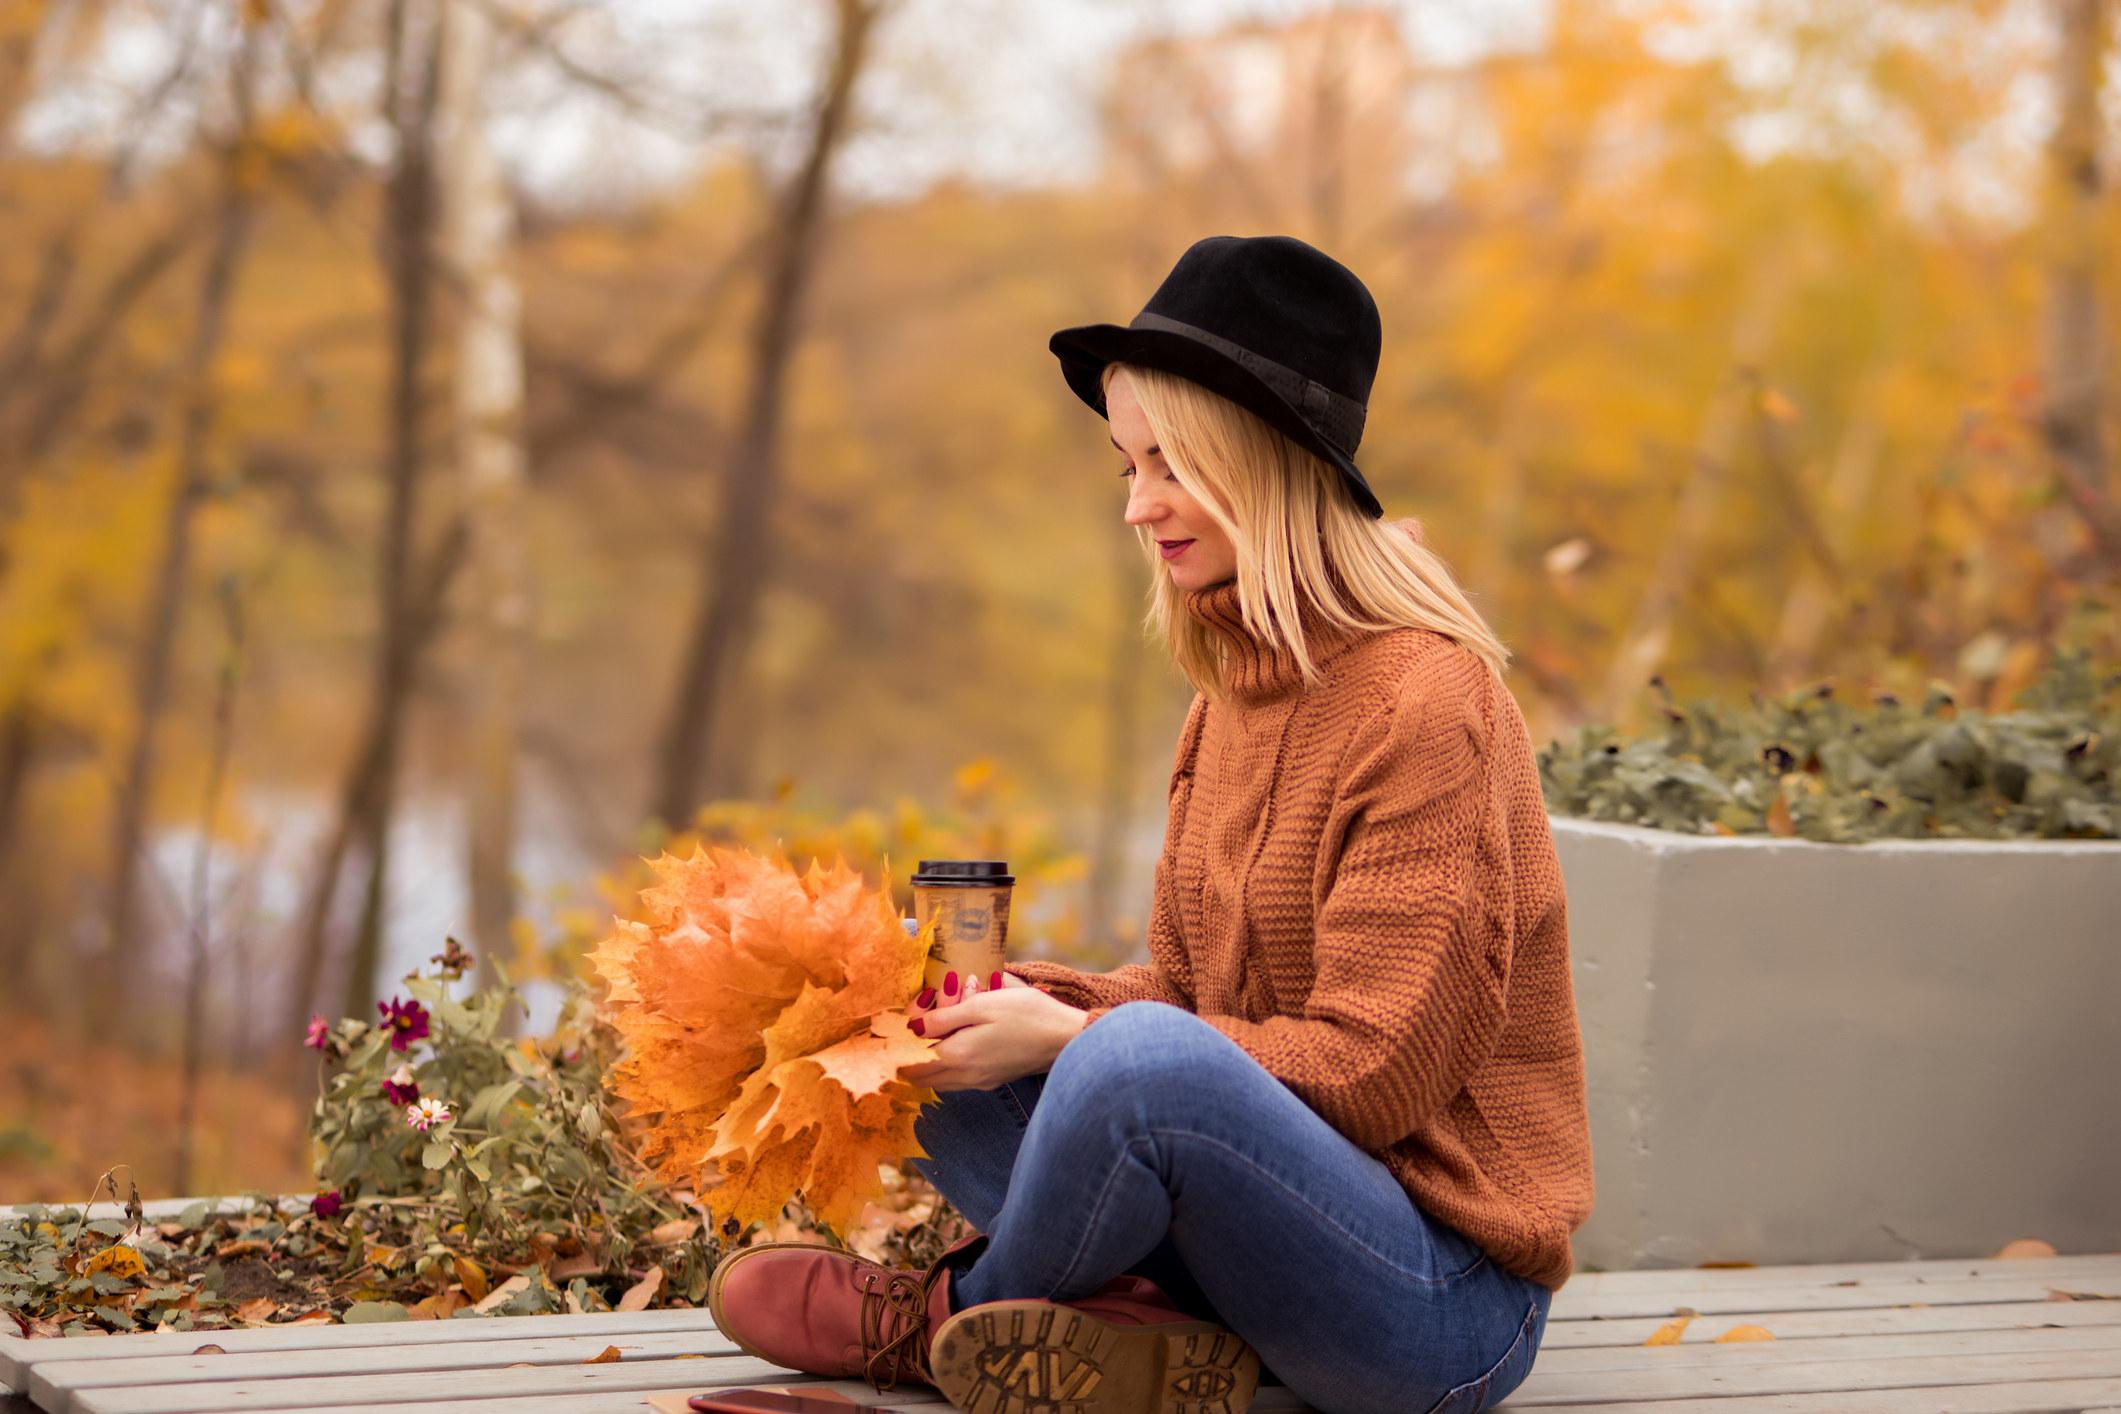 a girl celebrating fall